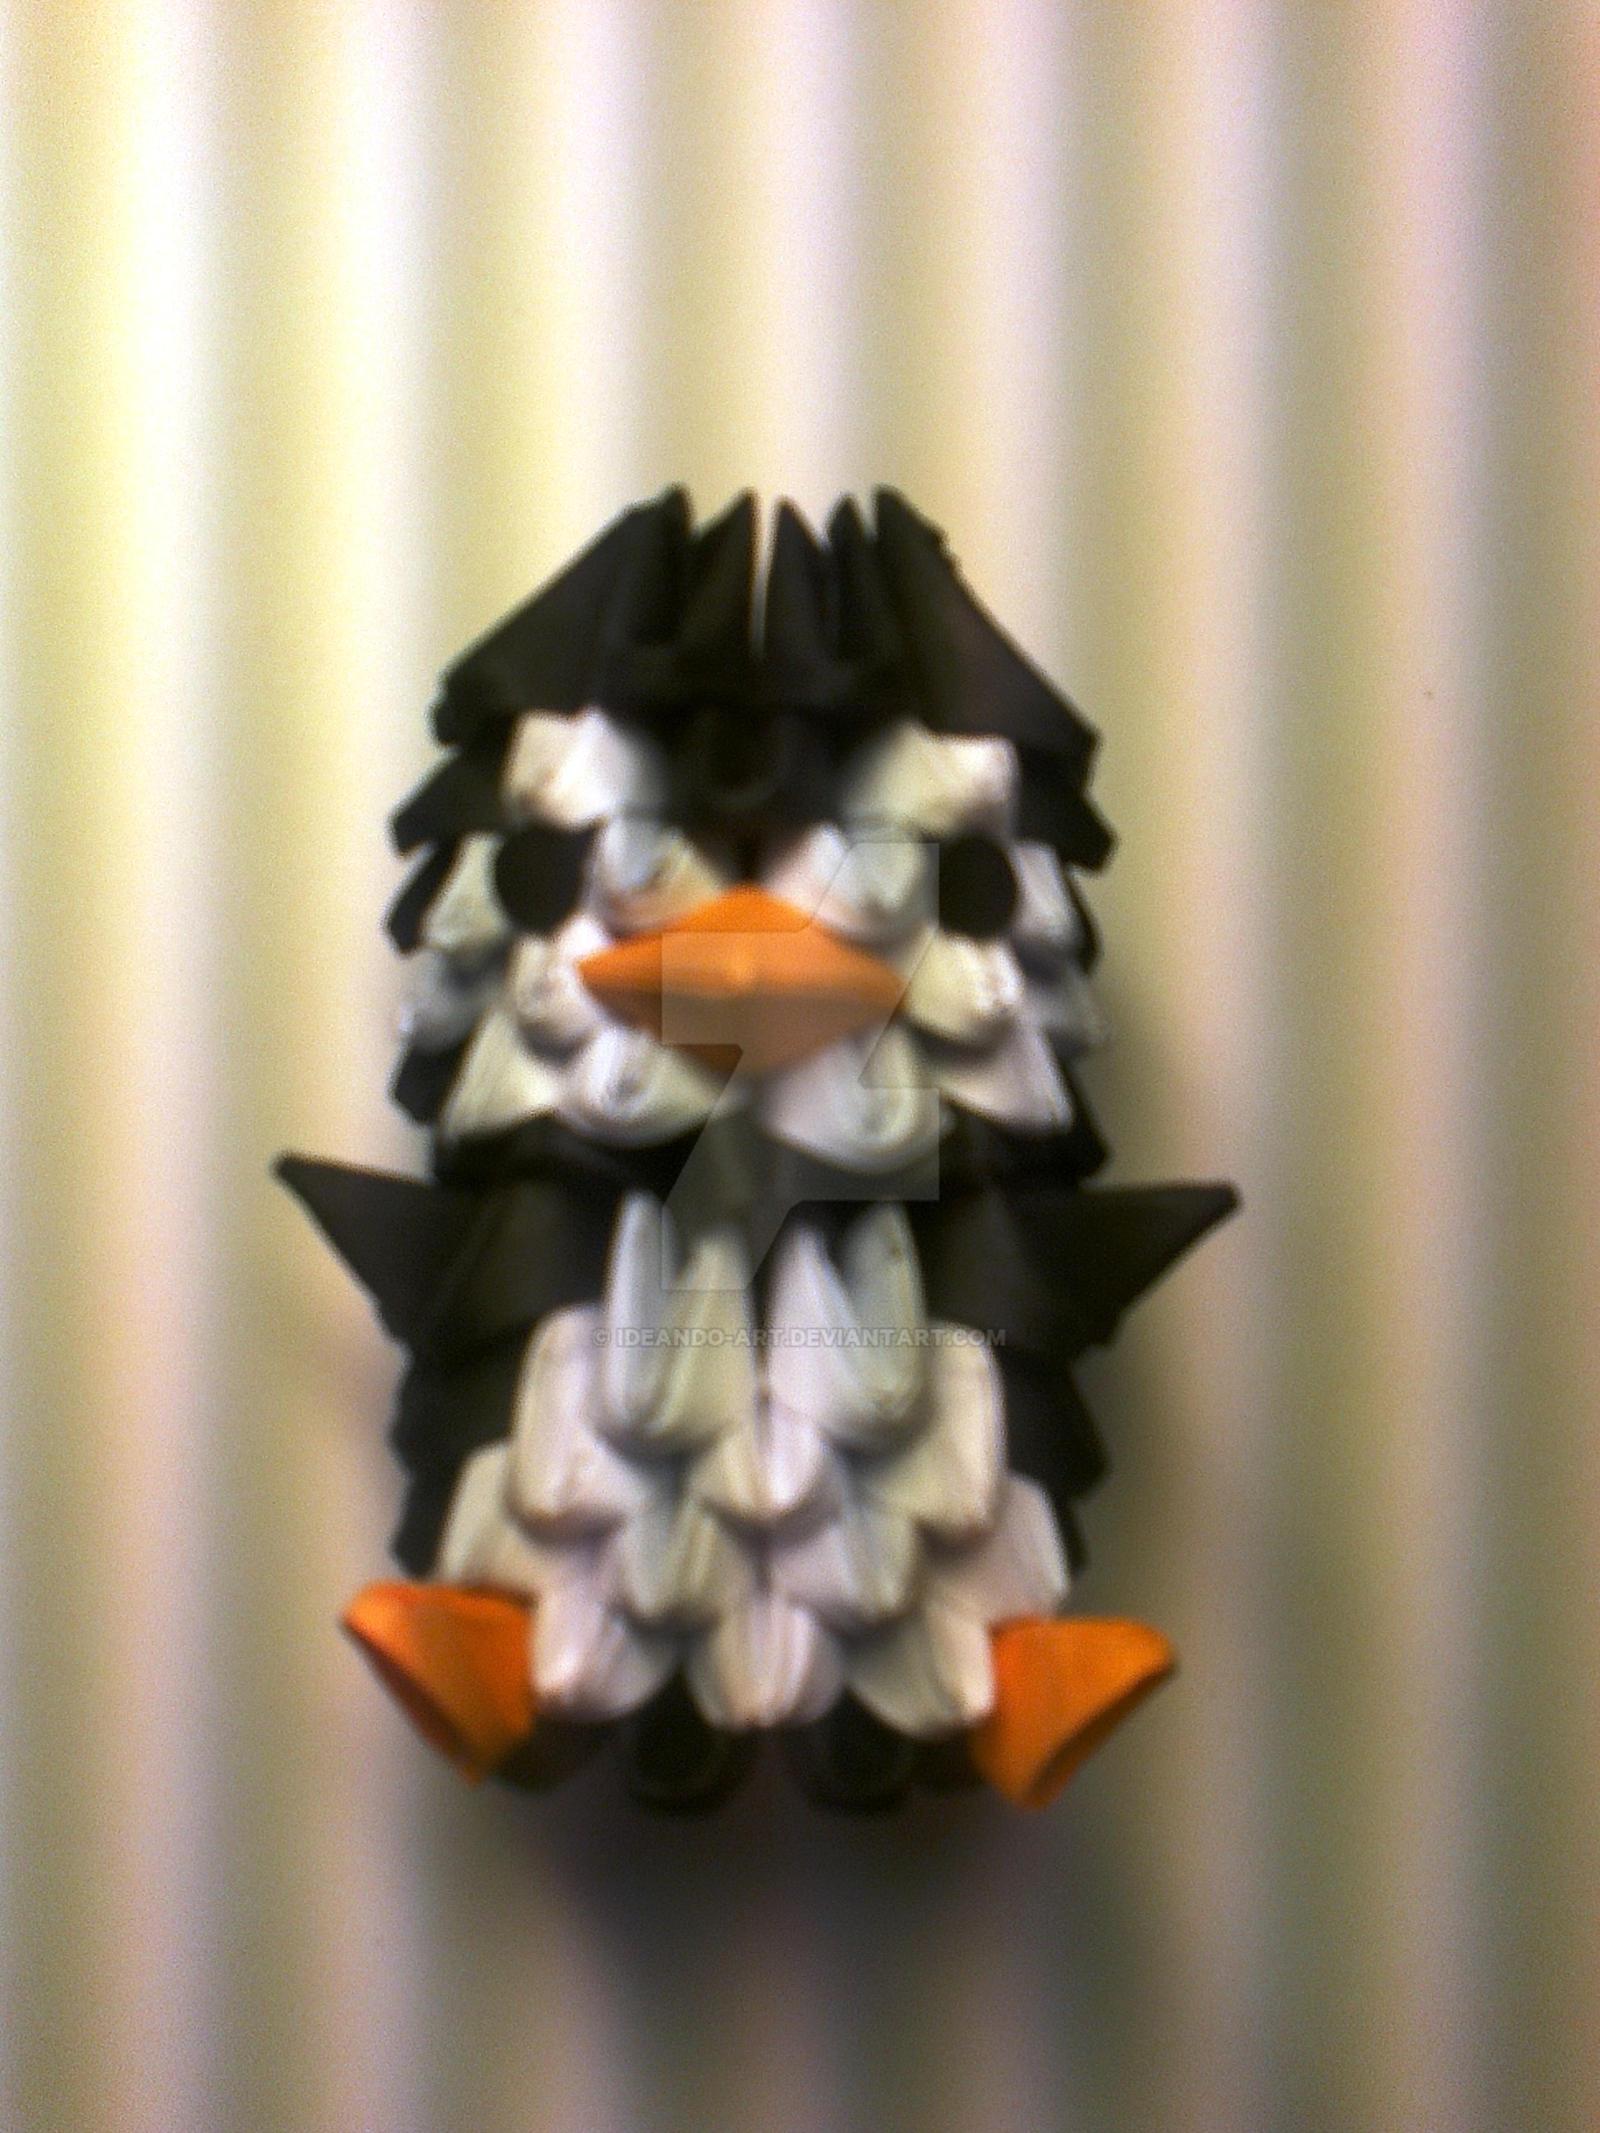 Origami 3D Funny Penguin by IDEAndo-art on DeviantArt - photo#19